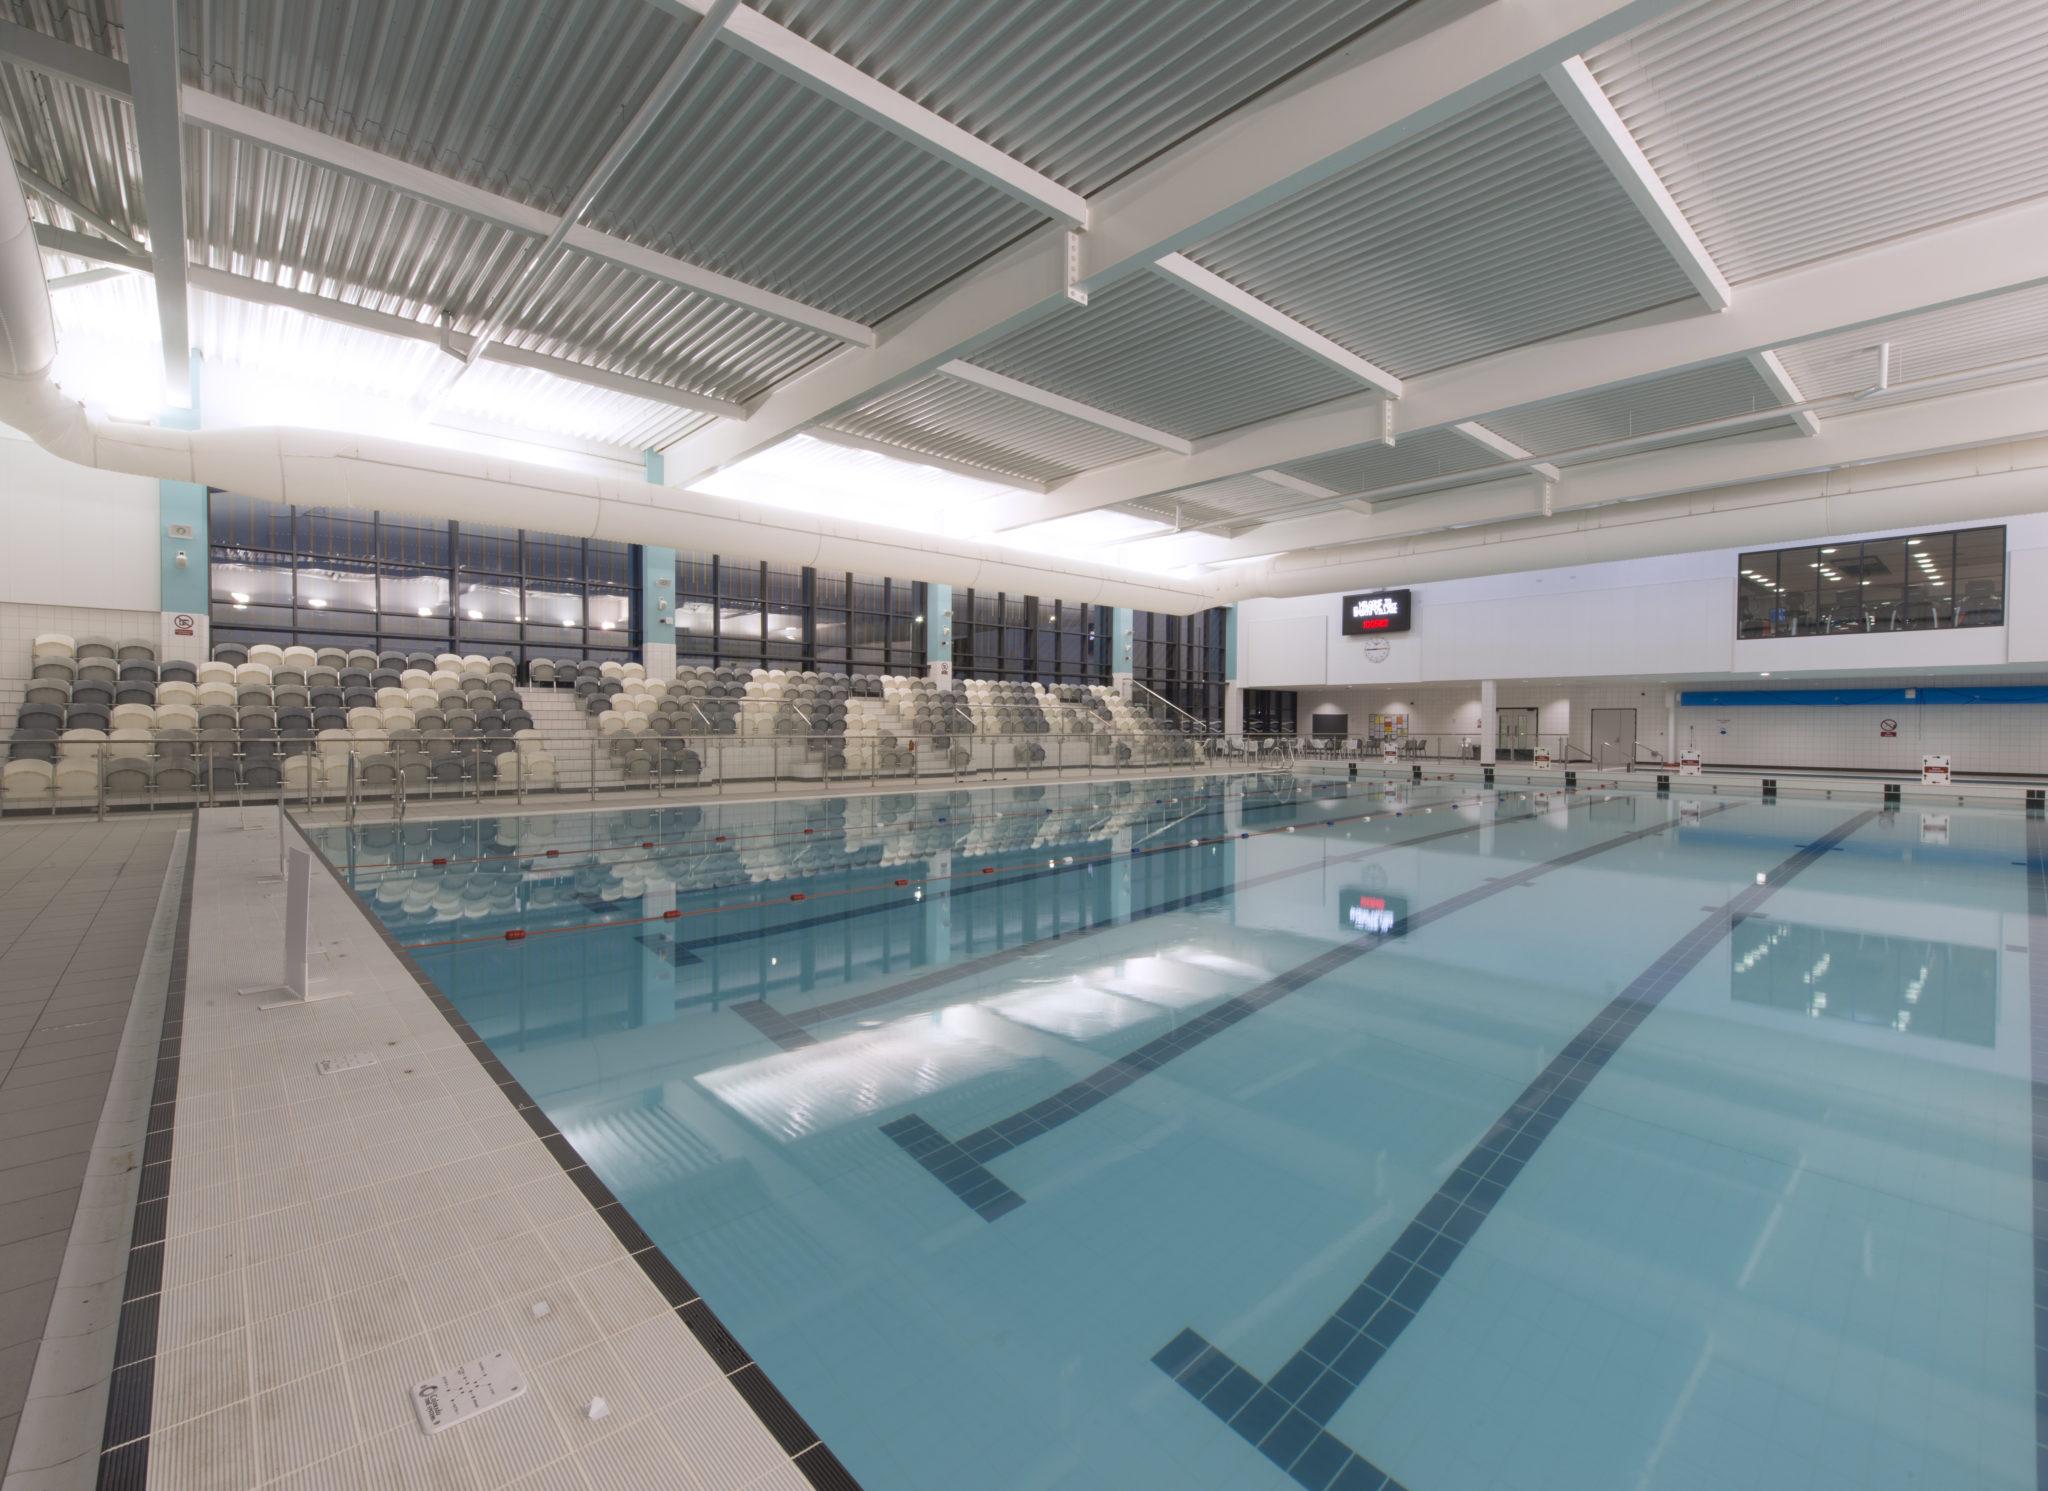 EPIC swimming pool